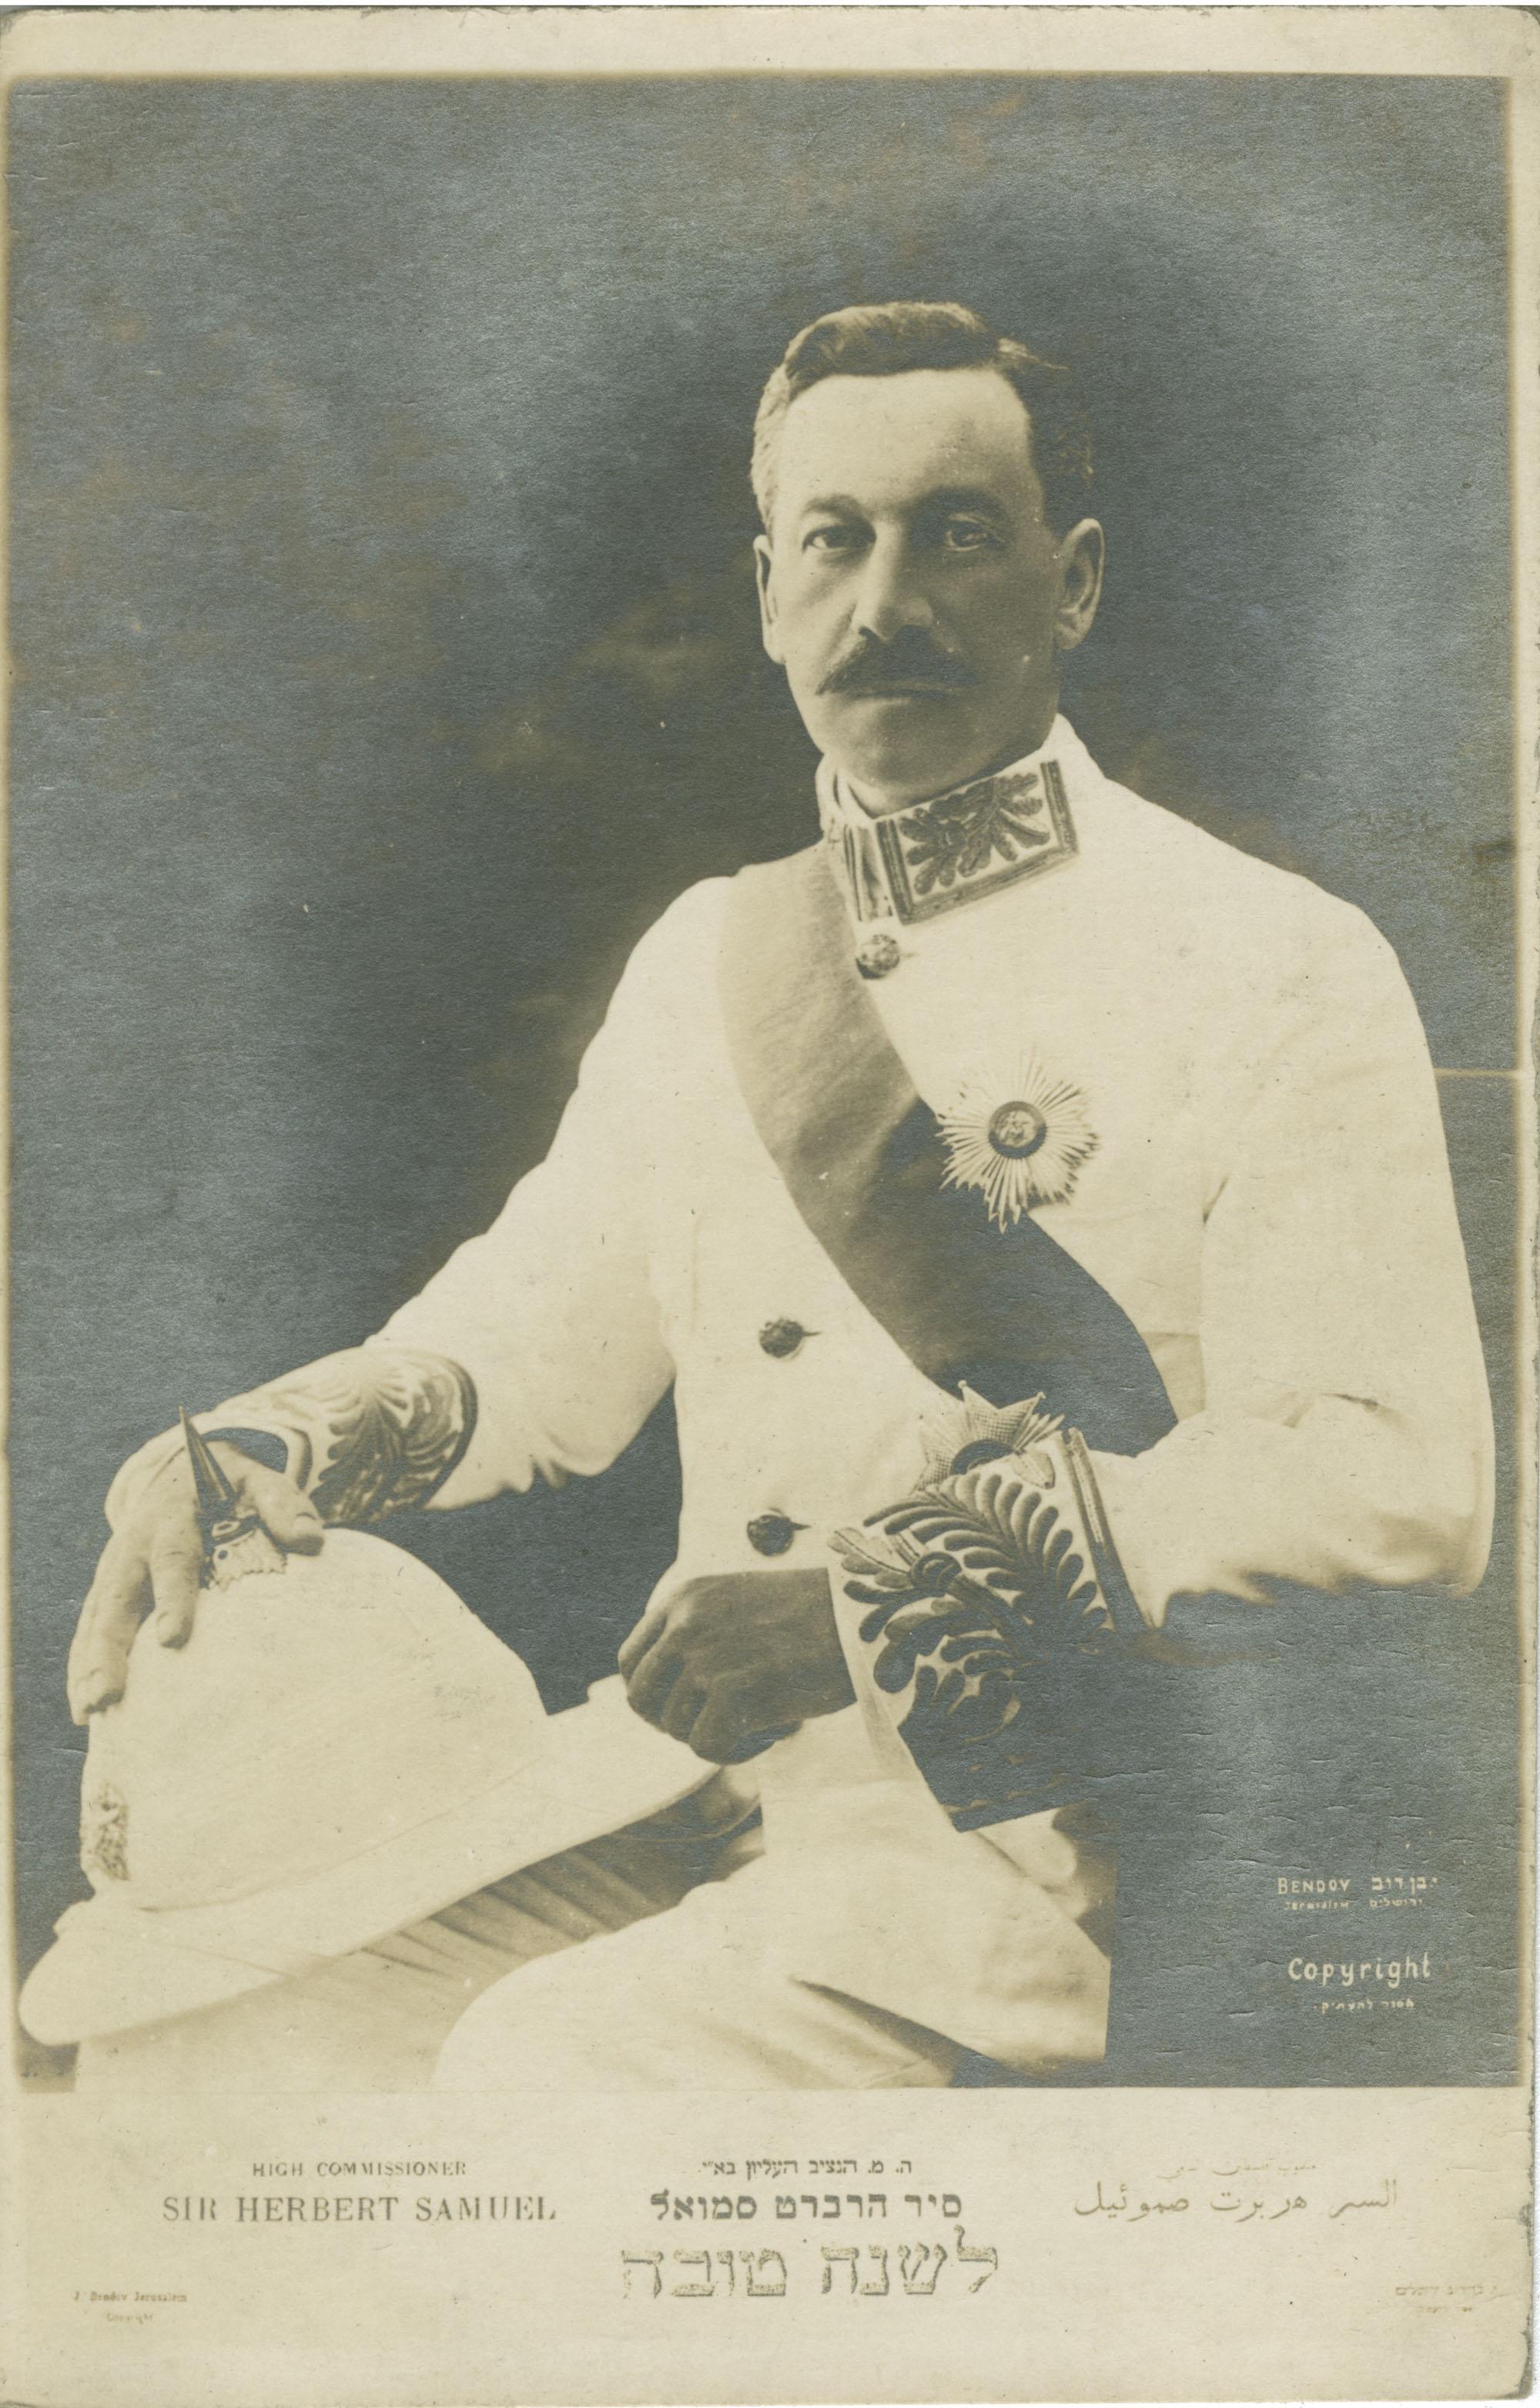 High Commissioner Sir Herbert Samuel / ה. מ. הנציב העליון בא''י סיר הרברט סמואל